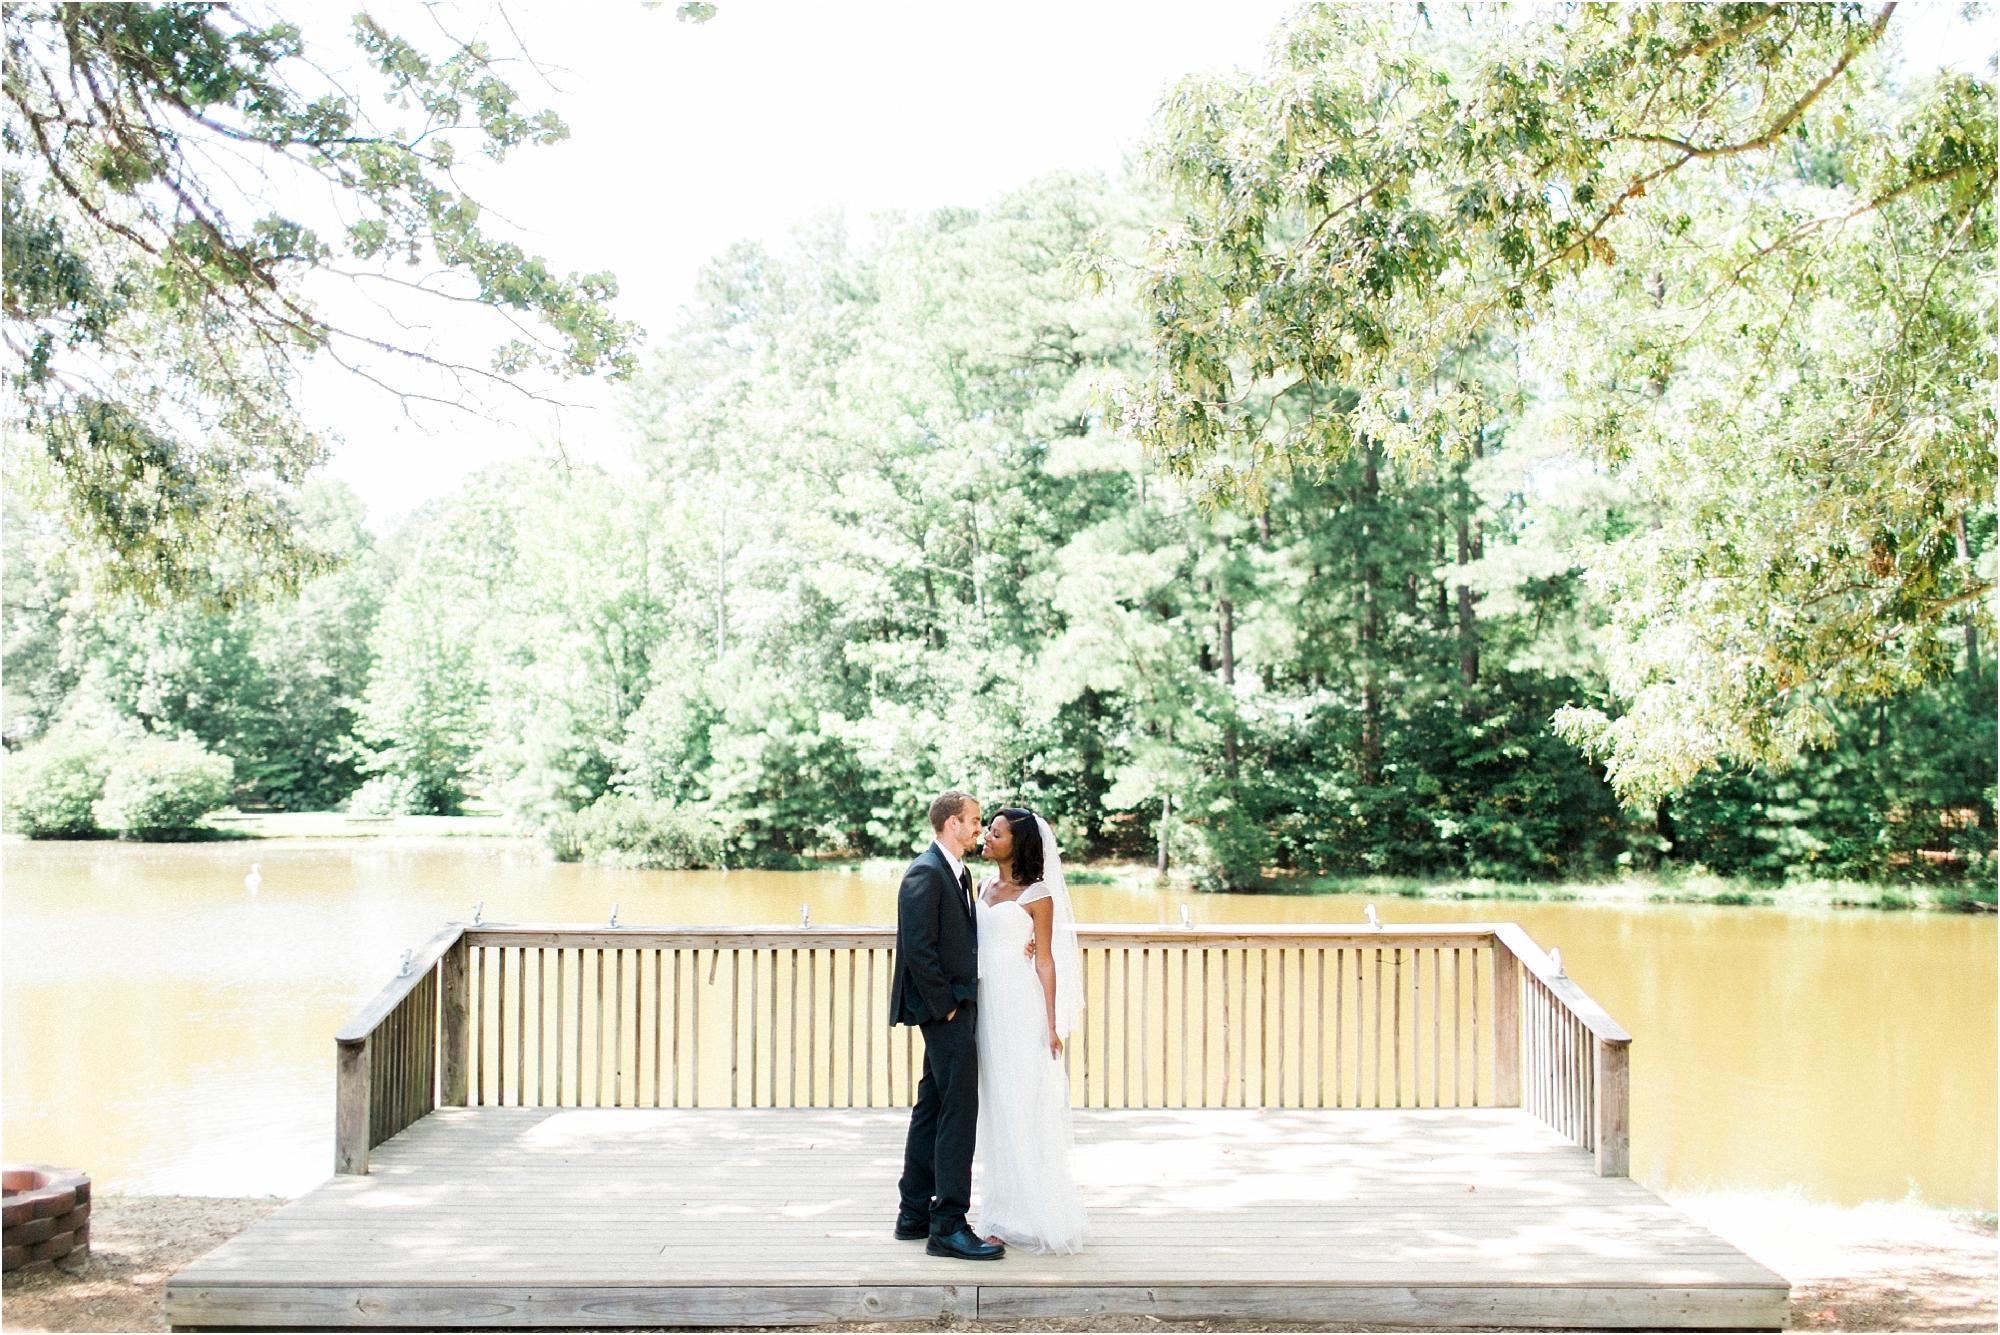 inimate-richmond-virginia-backyard-summer-wedding-photos_0001.jpg